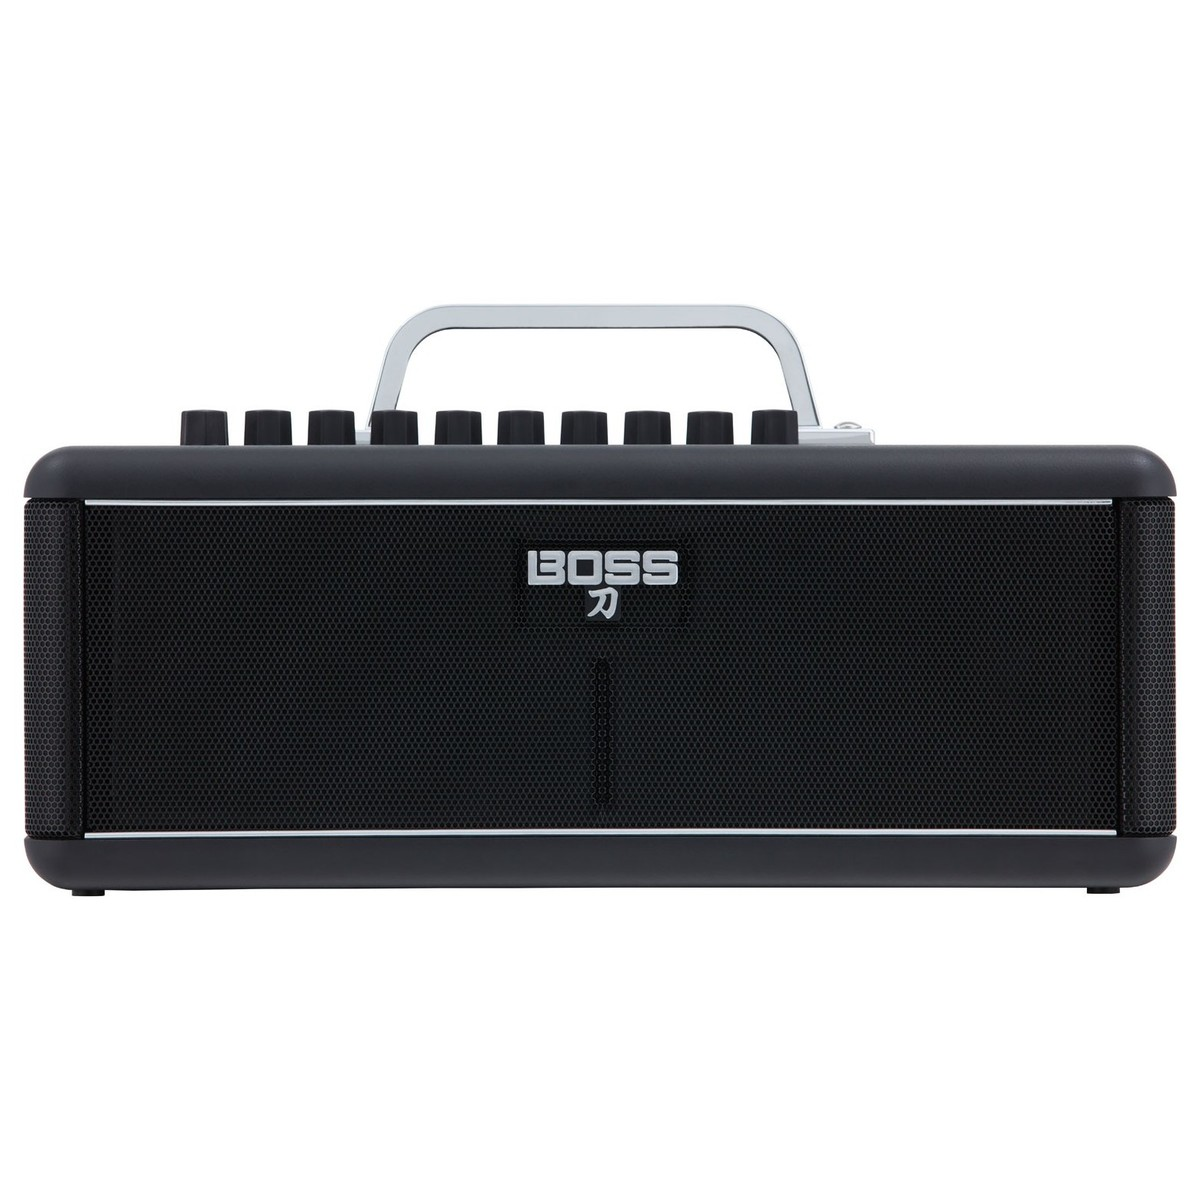 Boss Katana Air Wireless Guitar Amplifier At Gear4music Apmilifier Mini Bass Circuit And Explanation